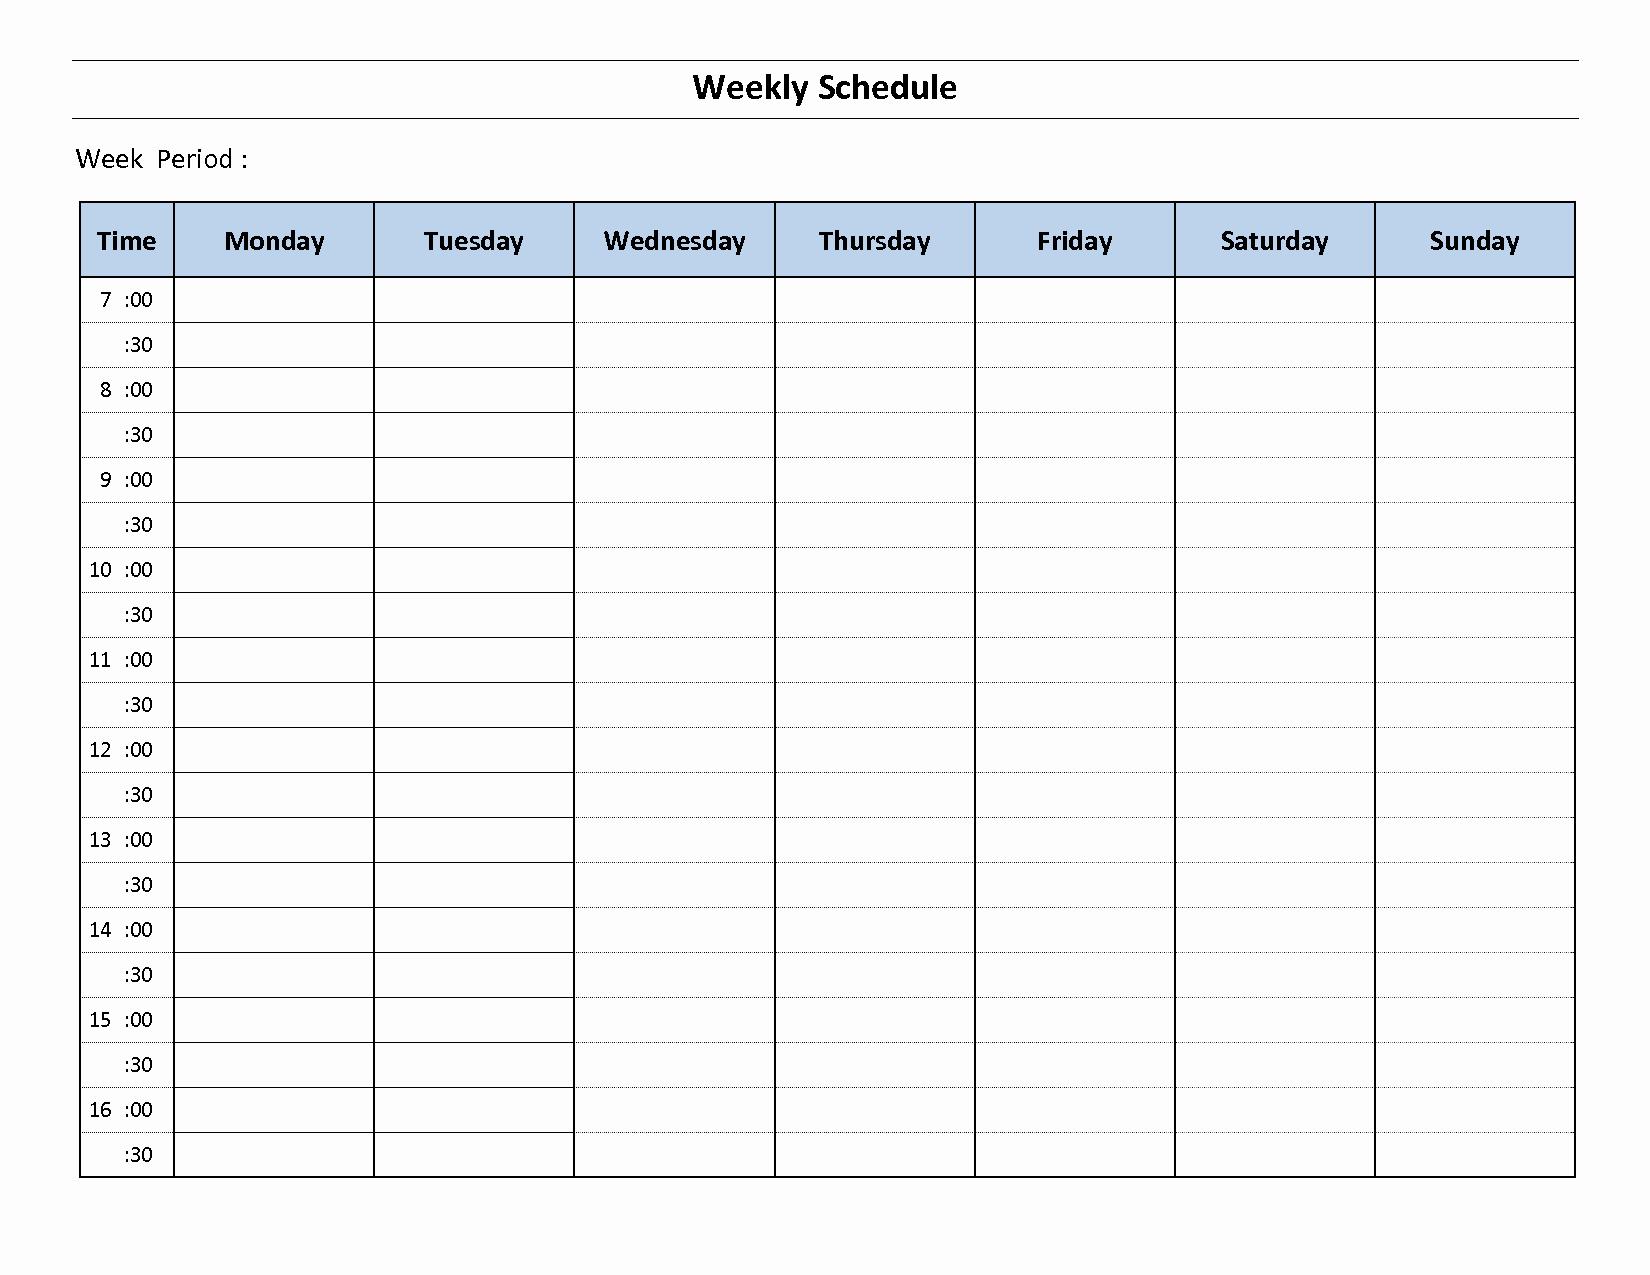 Sunday School Schedule Template Luxury Construction Schedule Template Excel Free Download